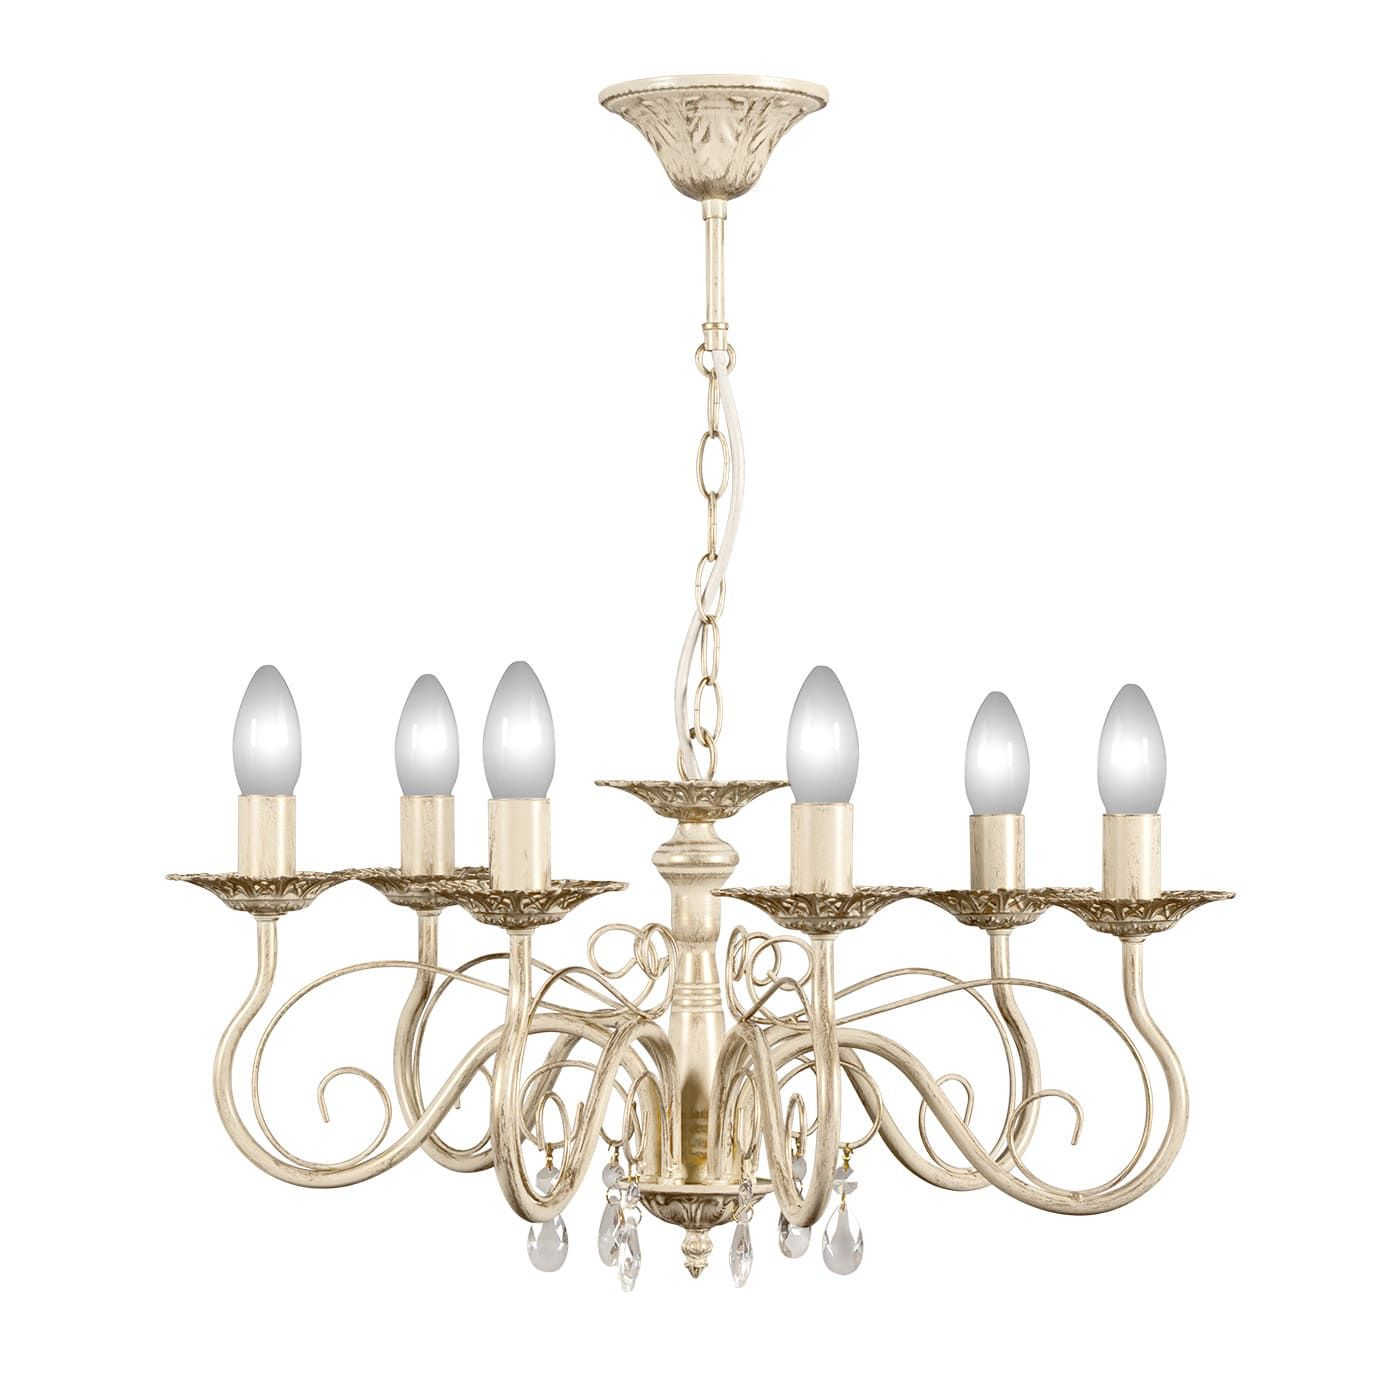 PETRASVET / Pendant chandelier S1020-6, 6xE14 max. 60W